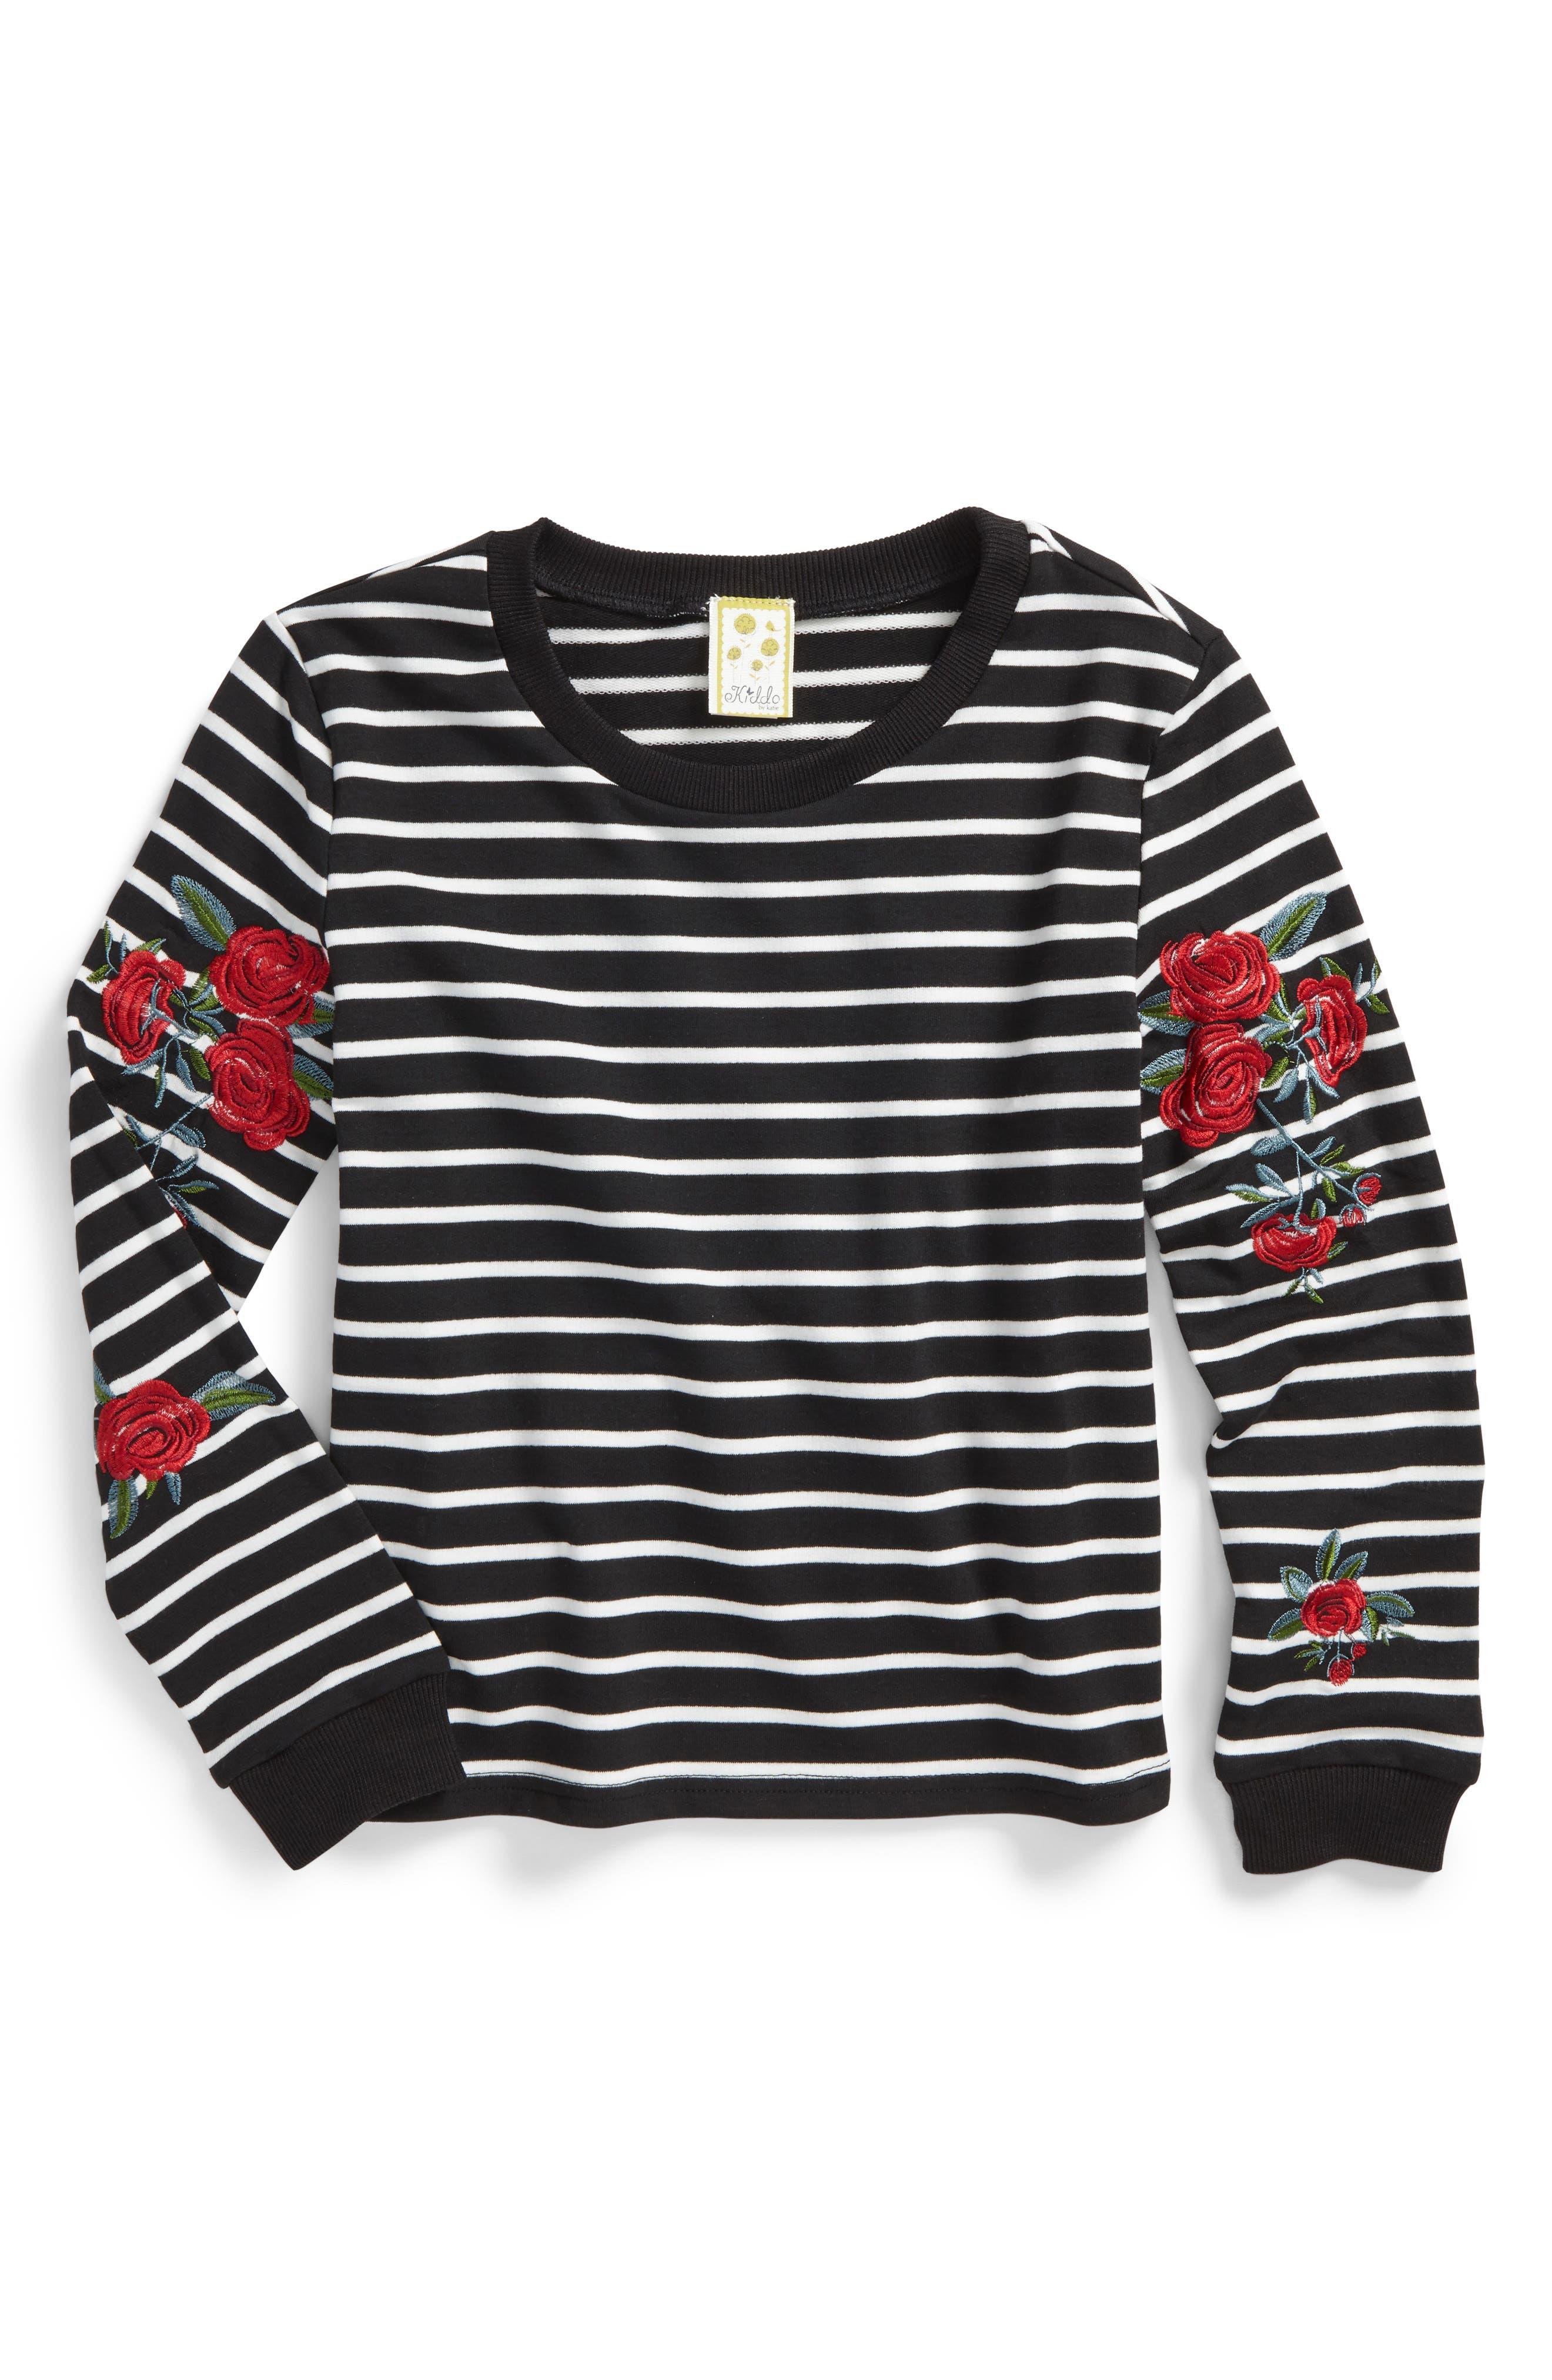 Embroidered Stripe Sweatshirt,                         Main,                         color, 001